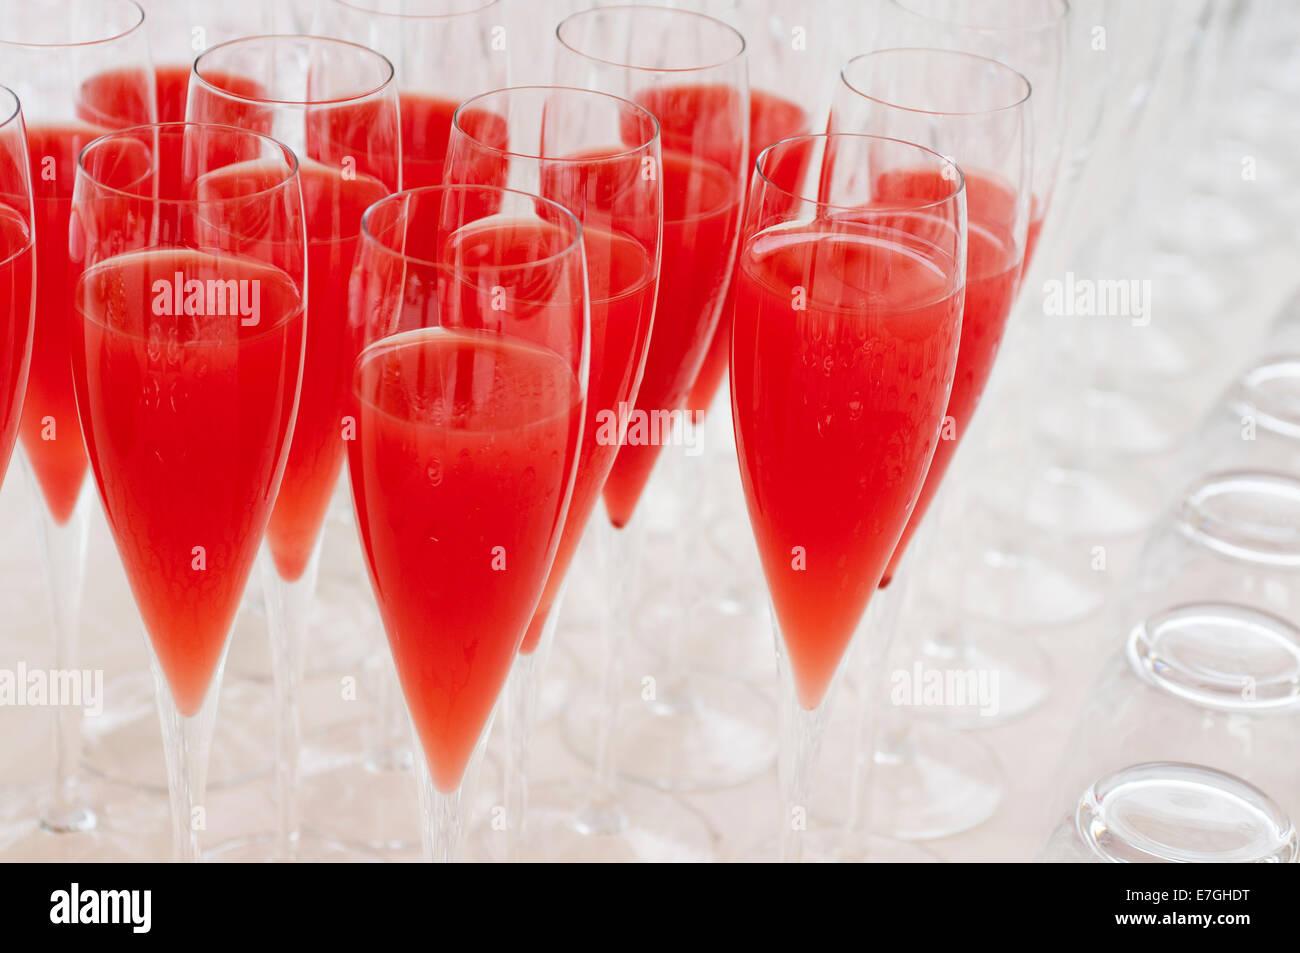 stemware for non-alcoholic aperitif on tray - Stock Image